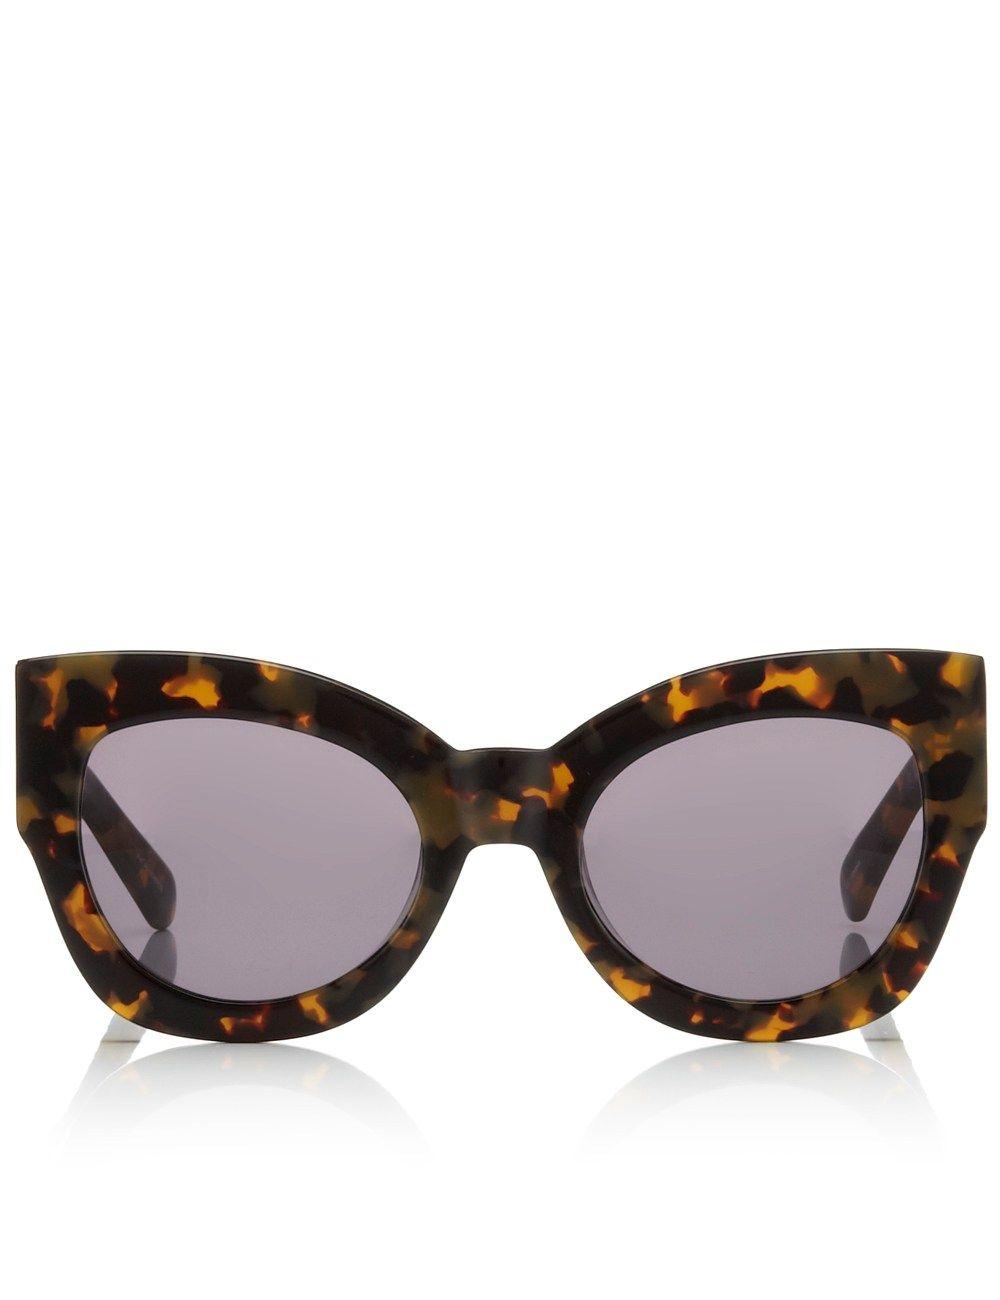 Tortoise Northern Lights Sunglasses | Karen Walker Eyewear | Avenue32